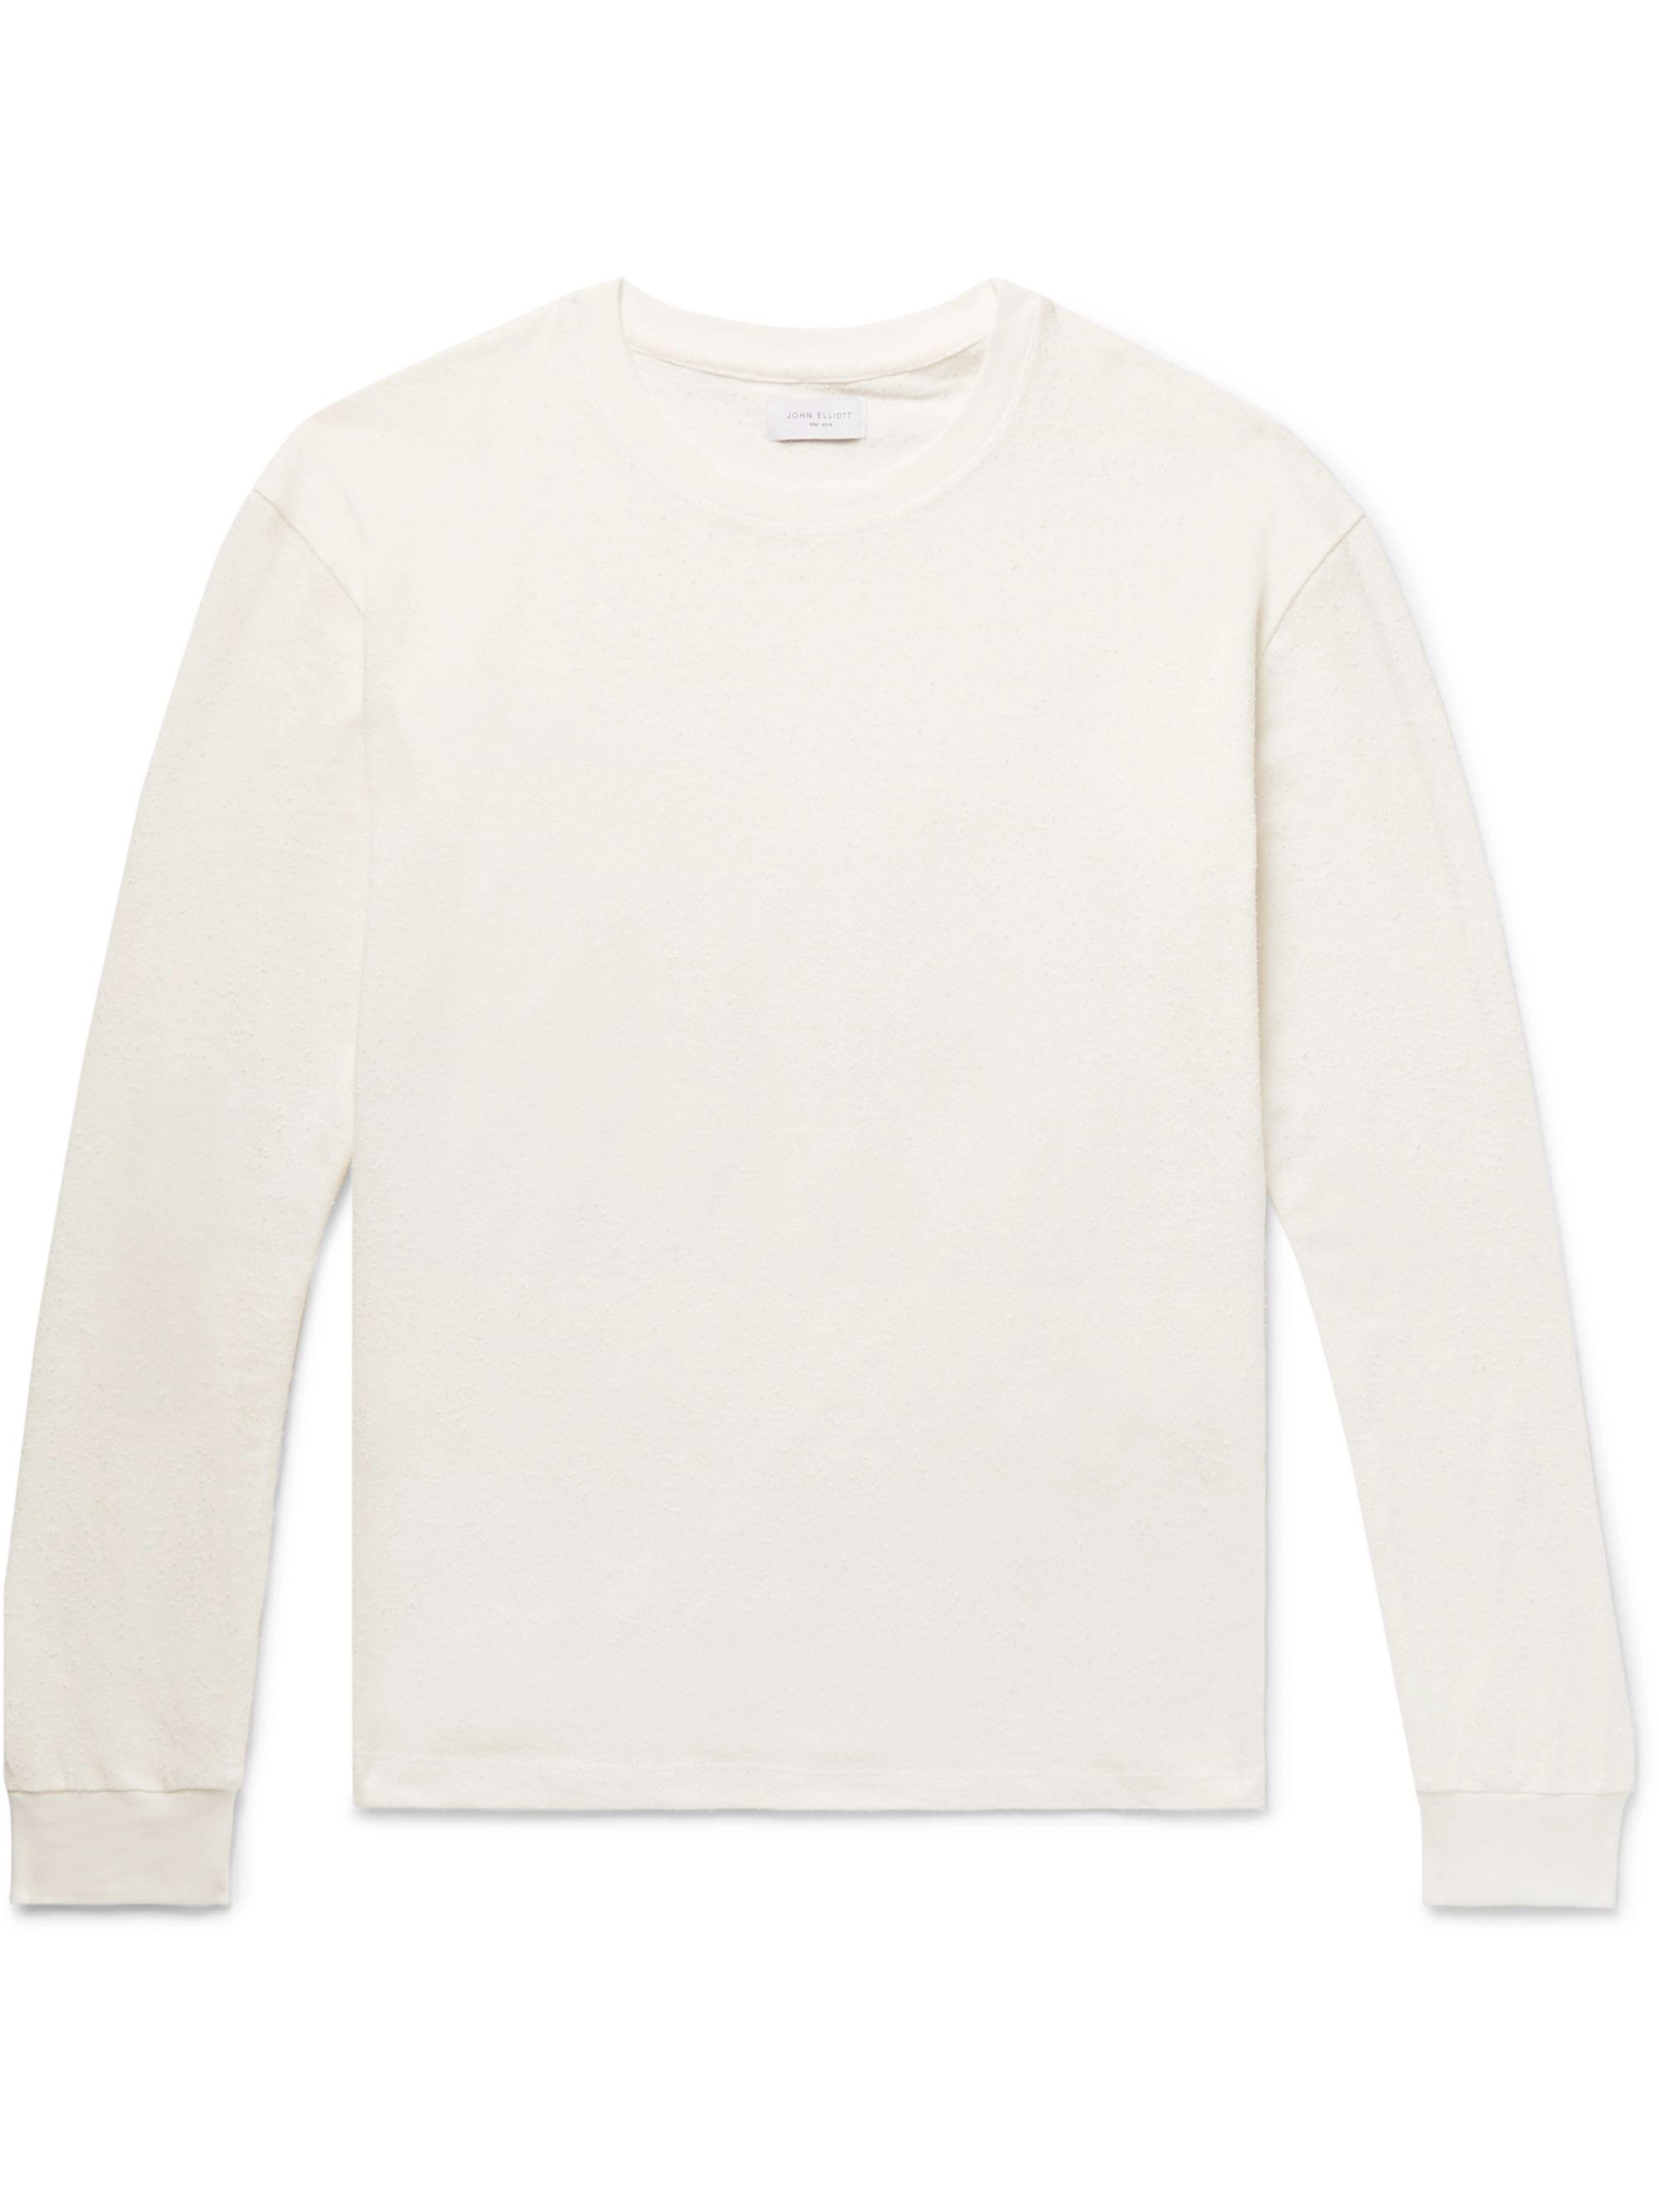 the latest aec80 a3732 Slub Cotton and Silk-Blend Jersey T-Shirt